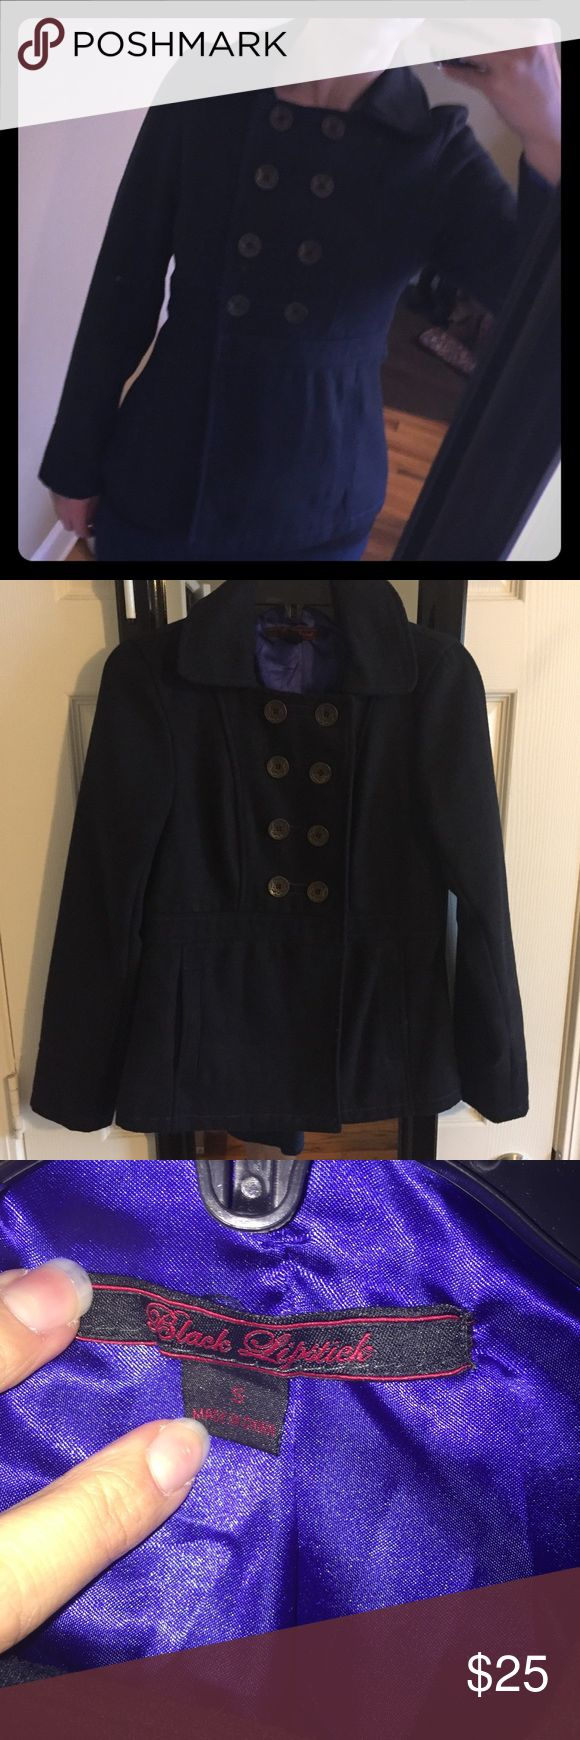 Navy Pea Coat Cute Navy Pea coat with 8 gold buttons. Black Lipstick Jackets & Coats Pea Coats